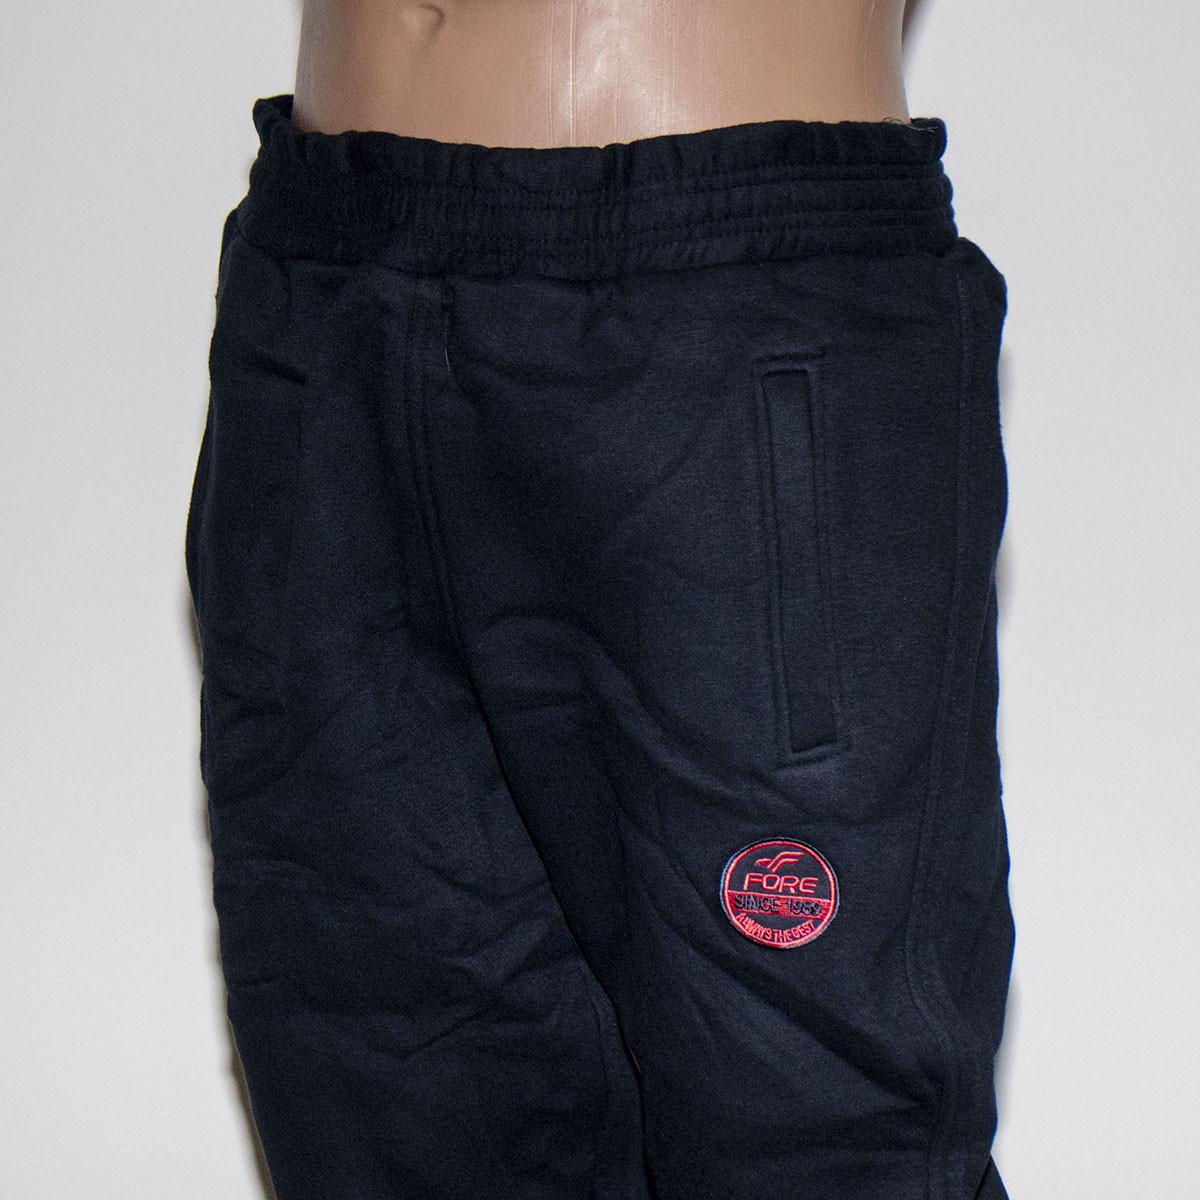 Спортивные зимние штаны на манжете трехнитка на мужчин баталы Турция тм. FORE 1151NG